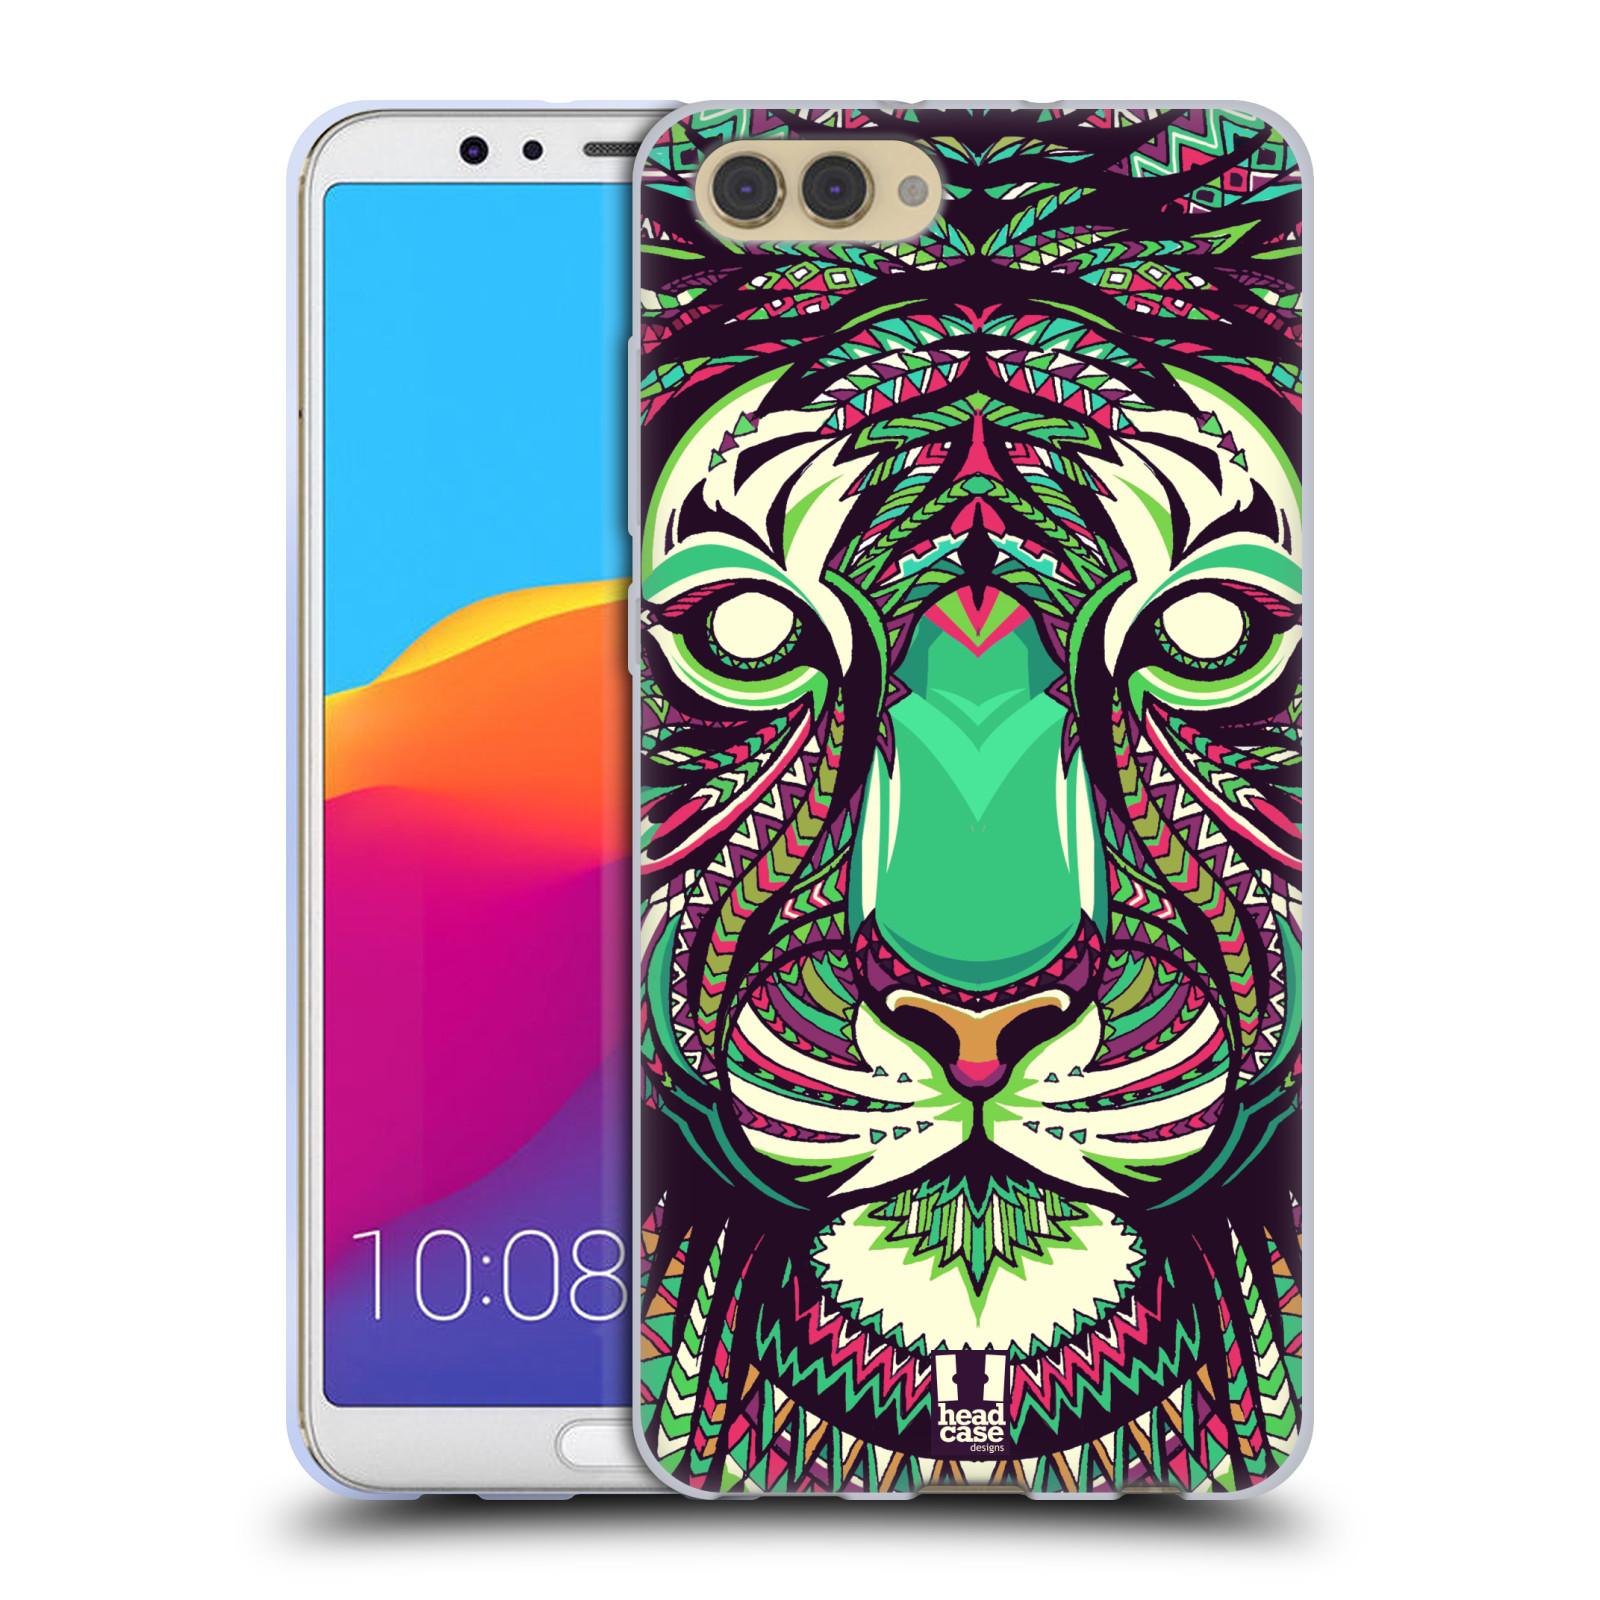 Silikonové pouzdro na mobil Honor View 10 - Head Case - AZTEC TYGR